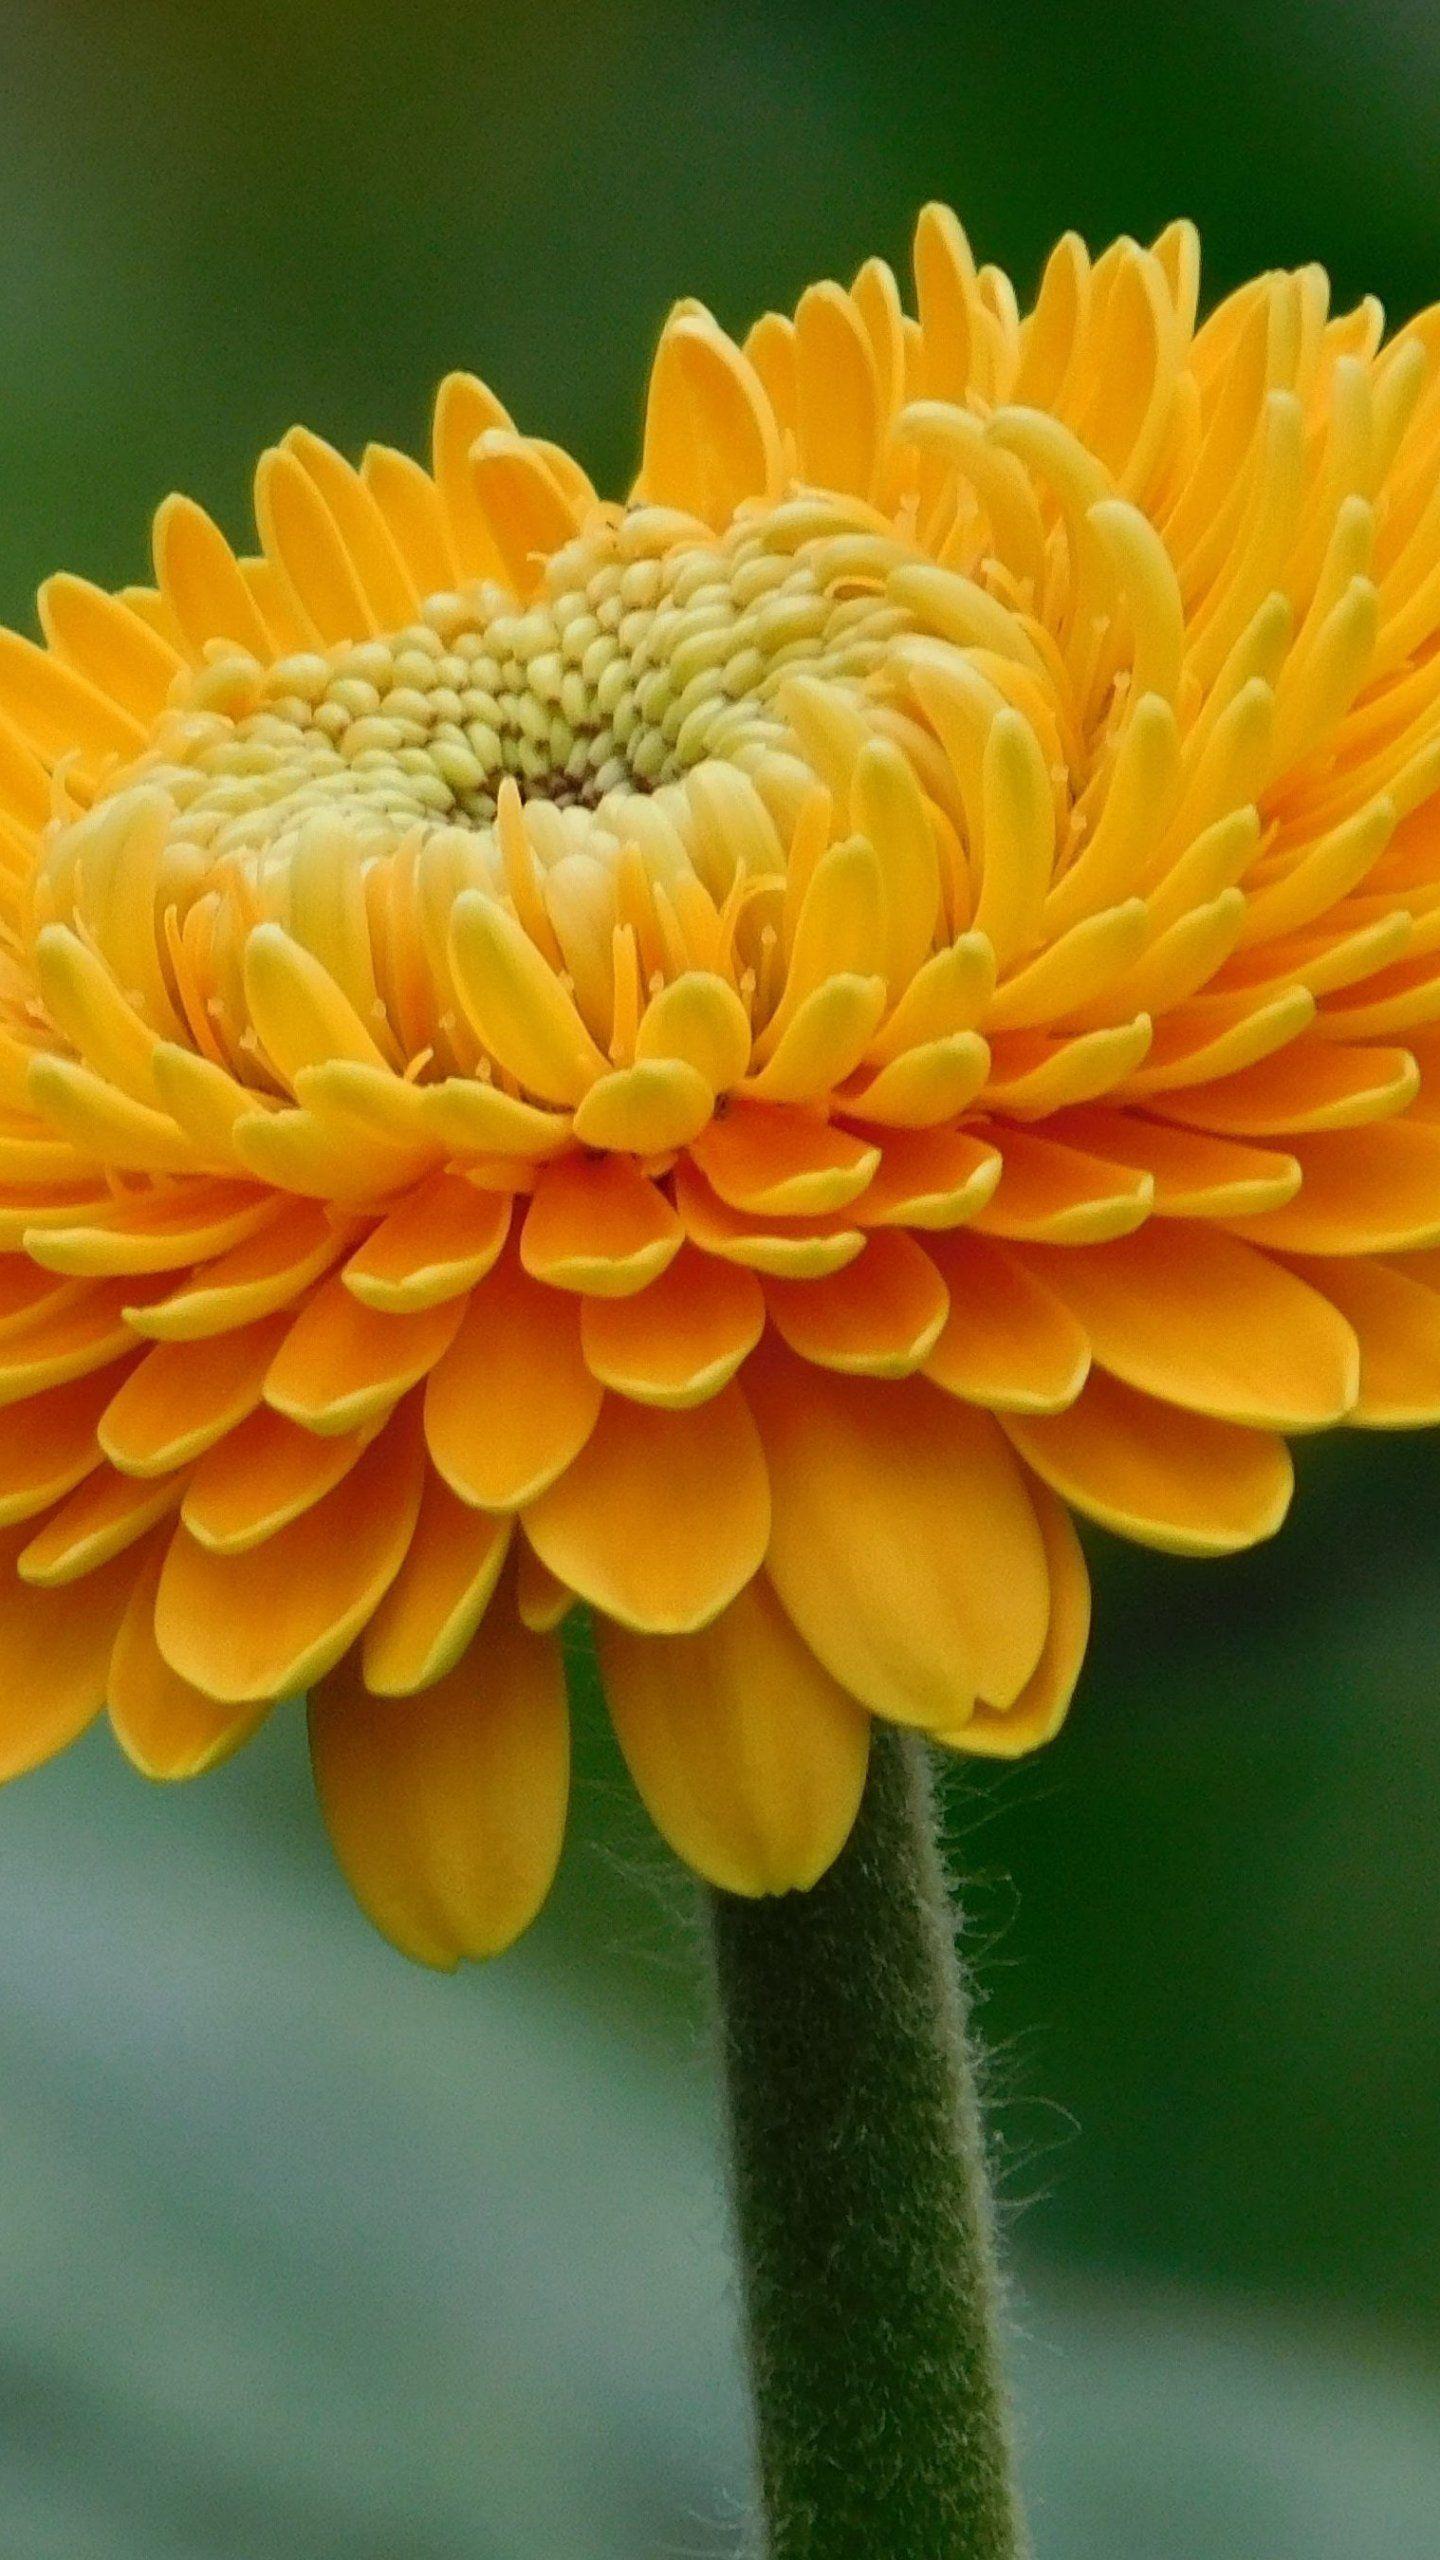 Orange Gerbera Flower Wallpaper Iphone Android Desktop Backgrounds Flower Iphone Wallpaper Yellow Flower Wallpaper Gerbera Flower